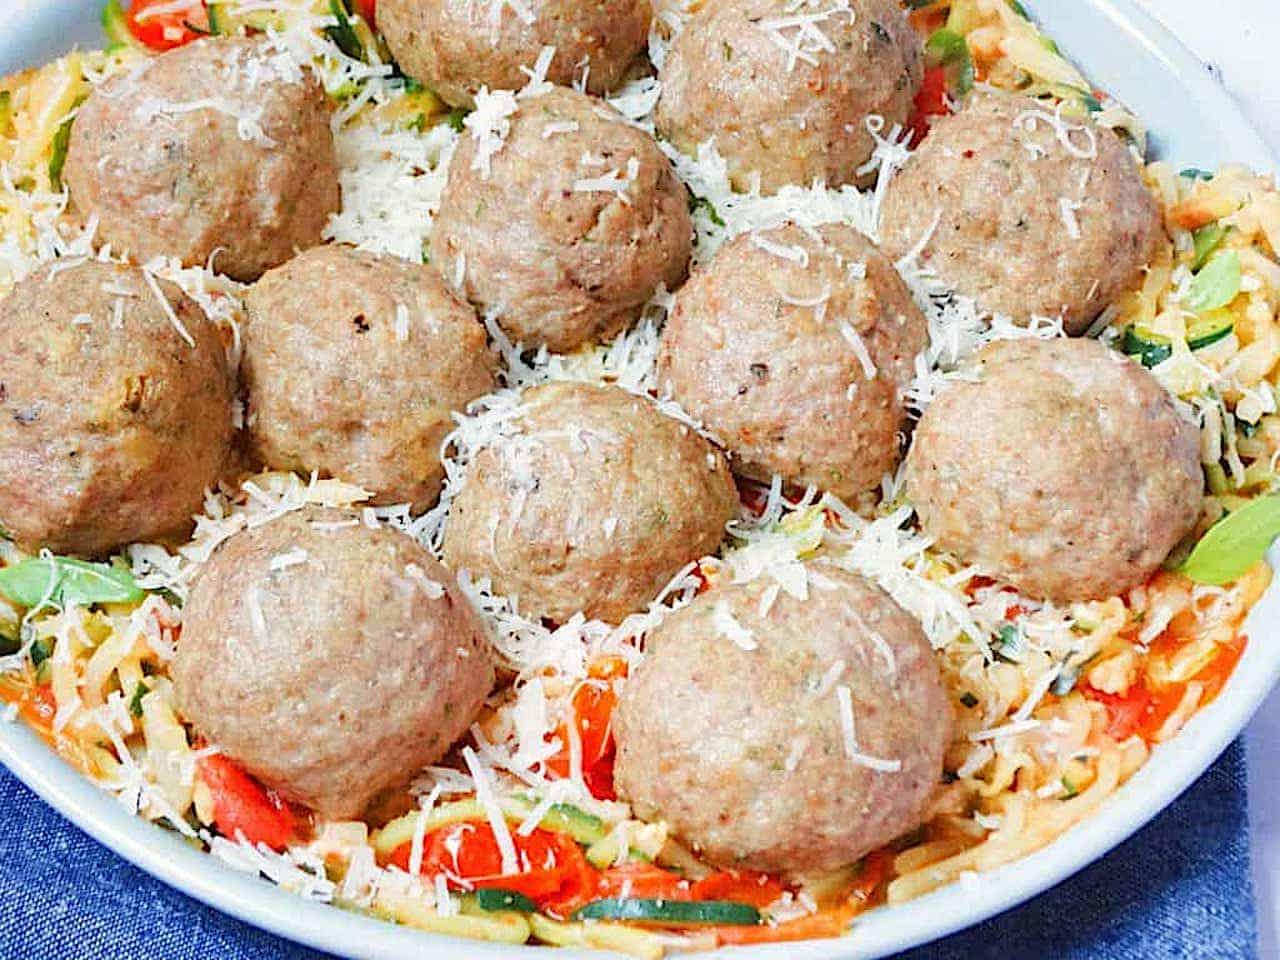 Italian Baked Turkey meatballs and zucchini noodles with turkey meatballs